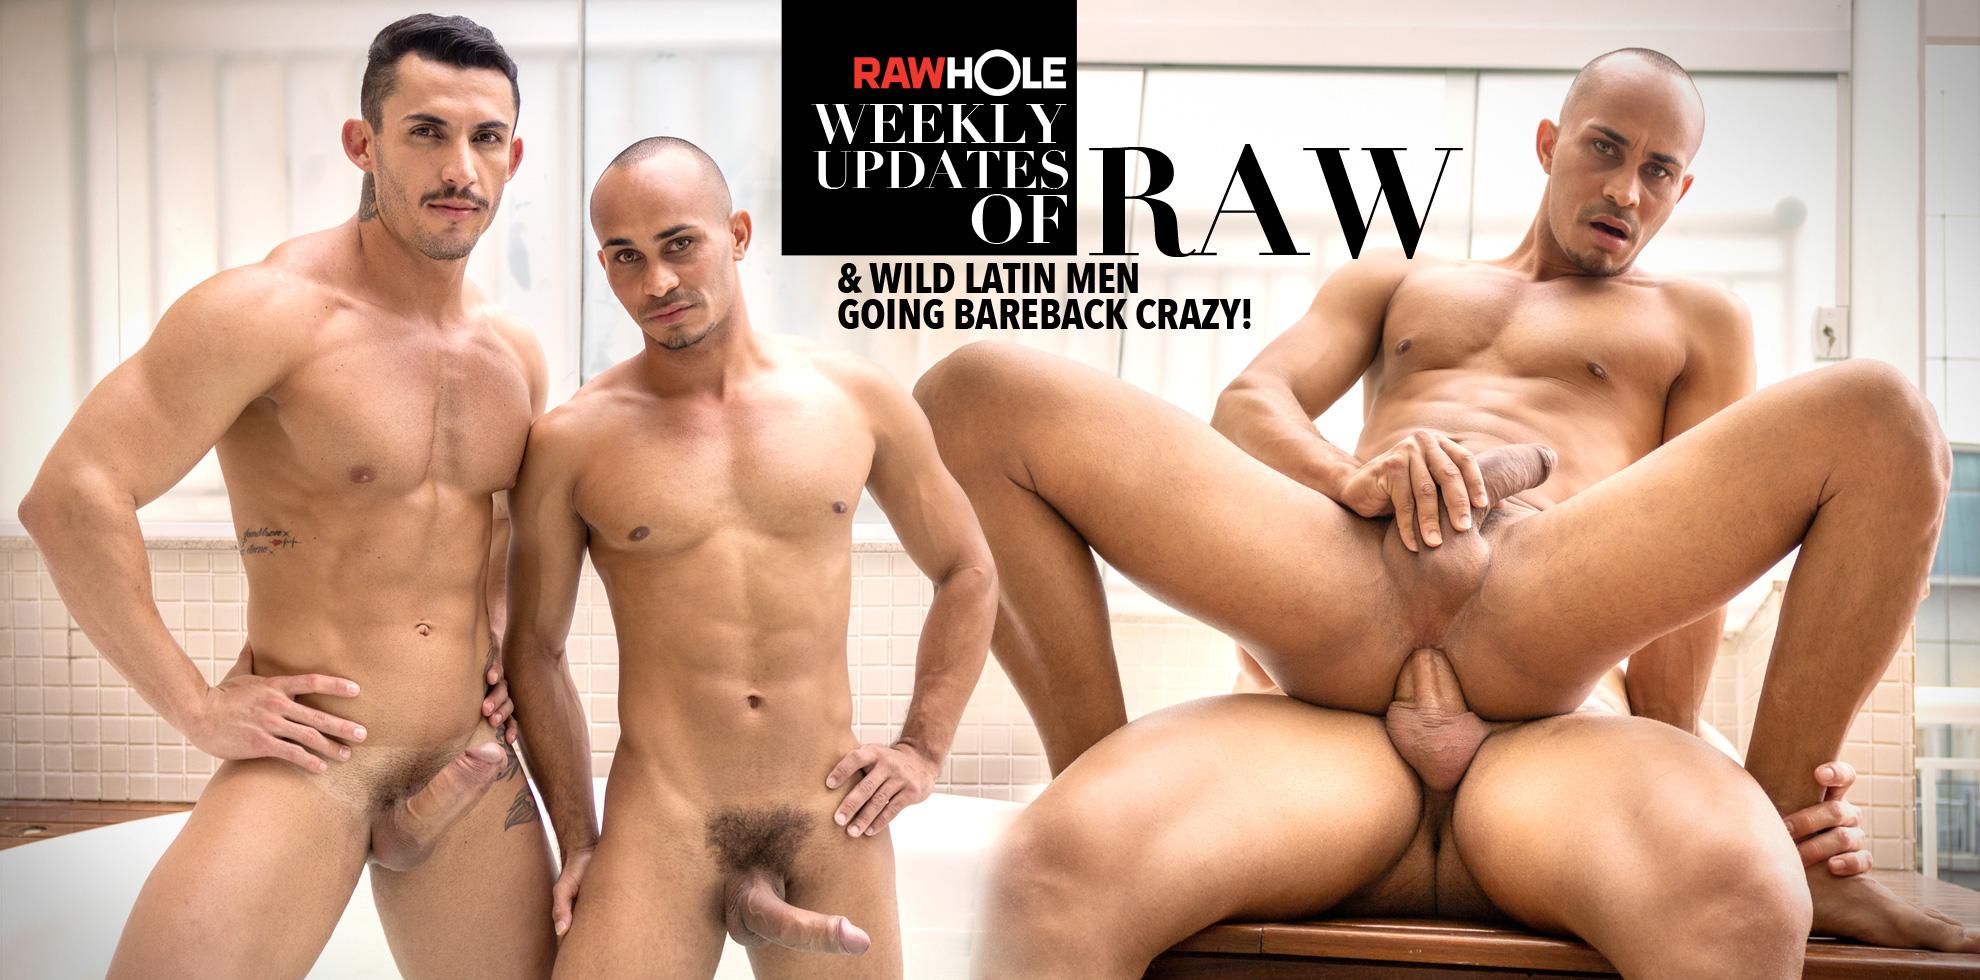 Gay Porno Image rawhole - best in gay bareback latino men porn from brazil